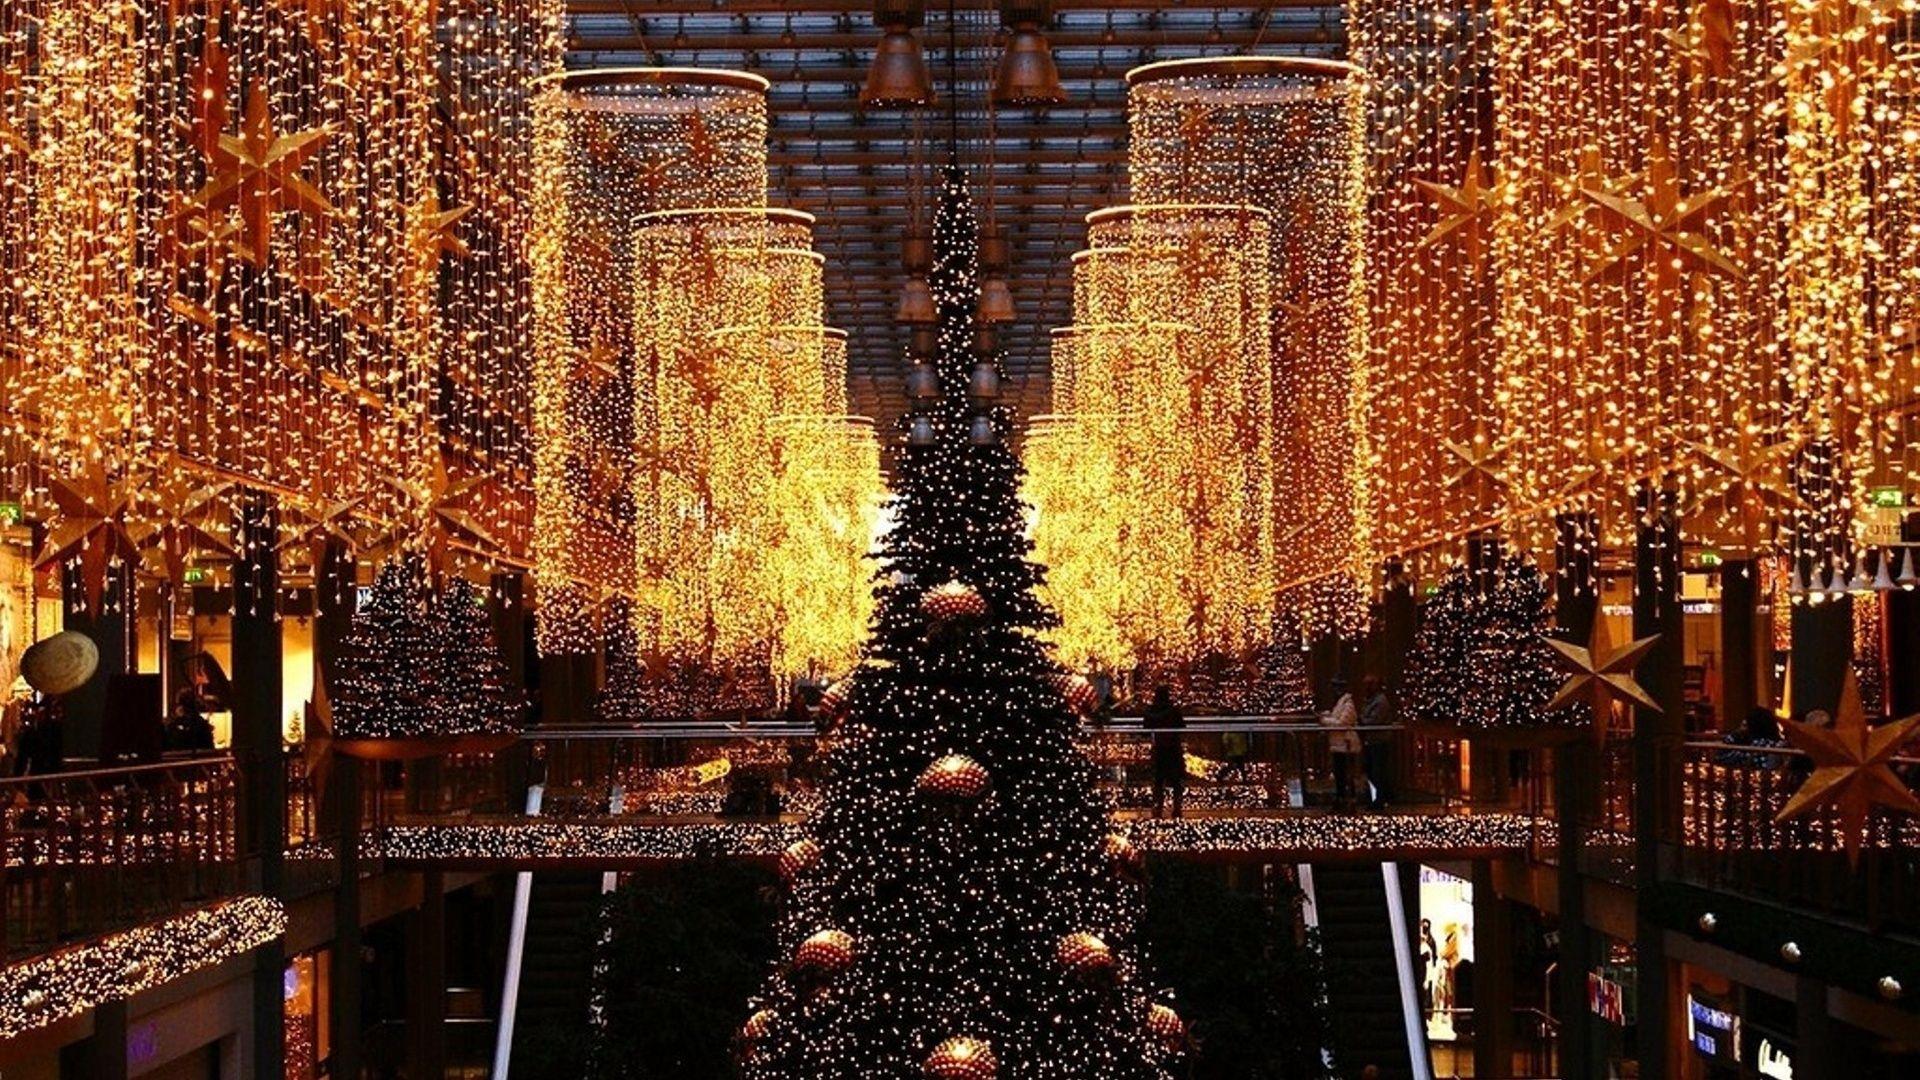 Christmas Tree HD 1080 wallpaper